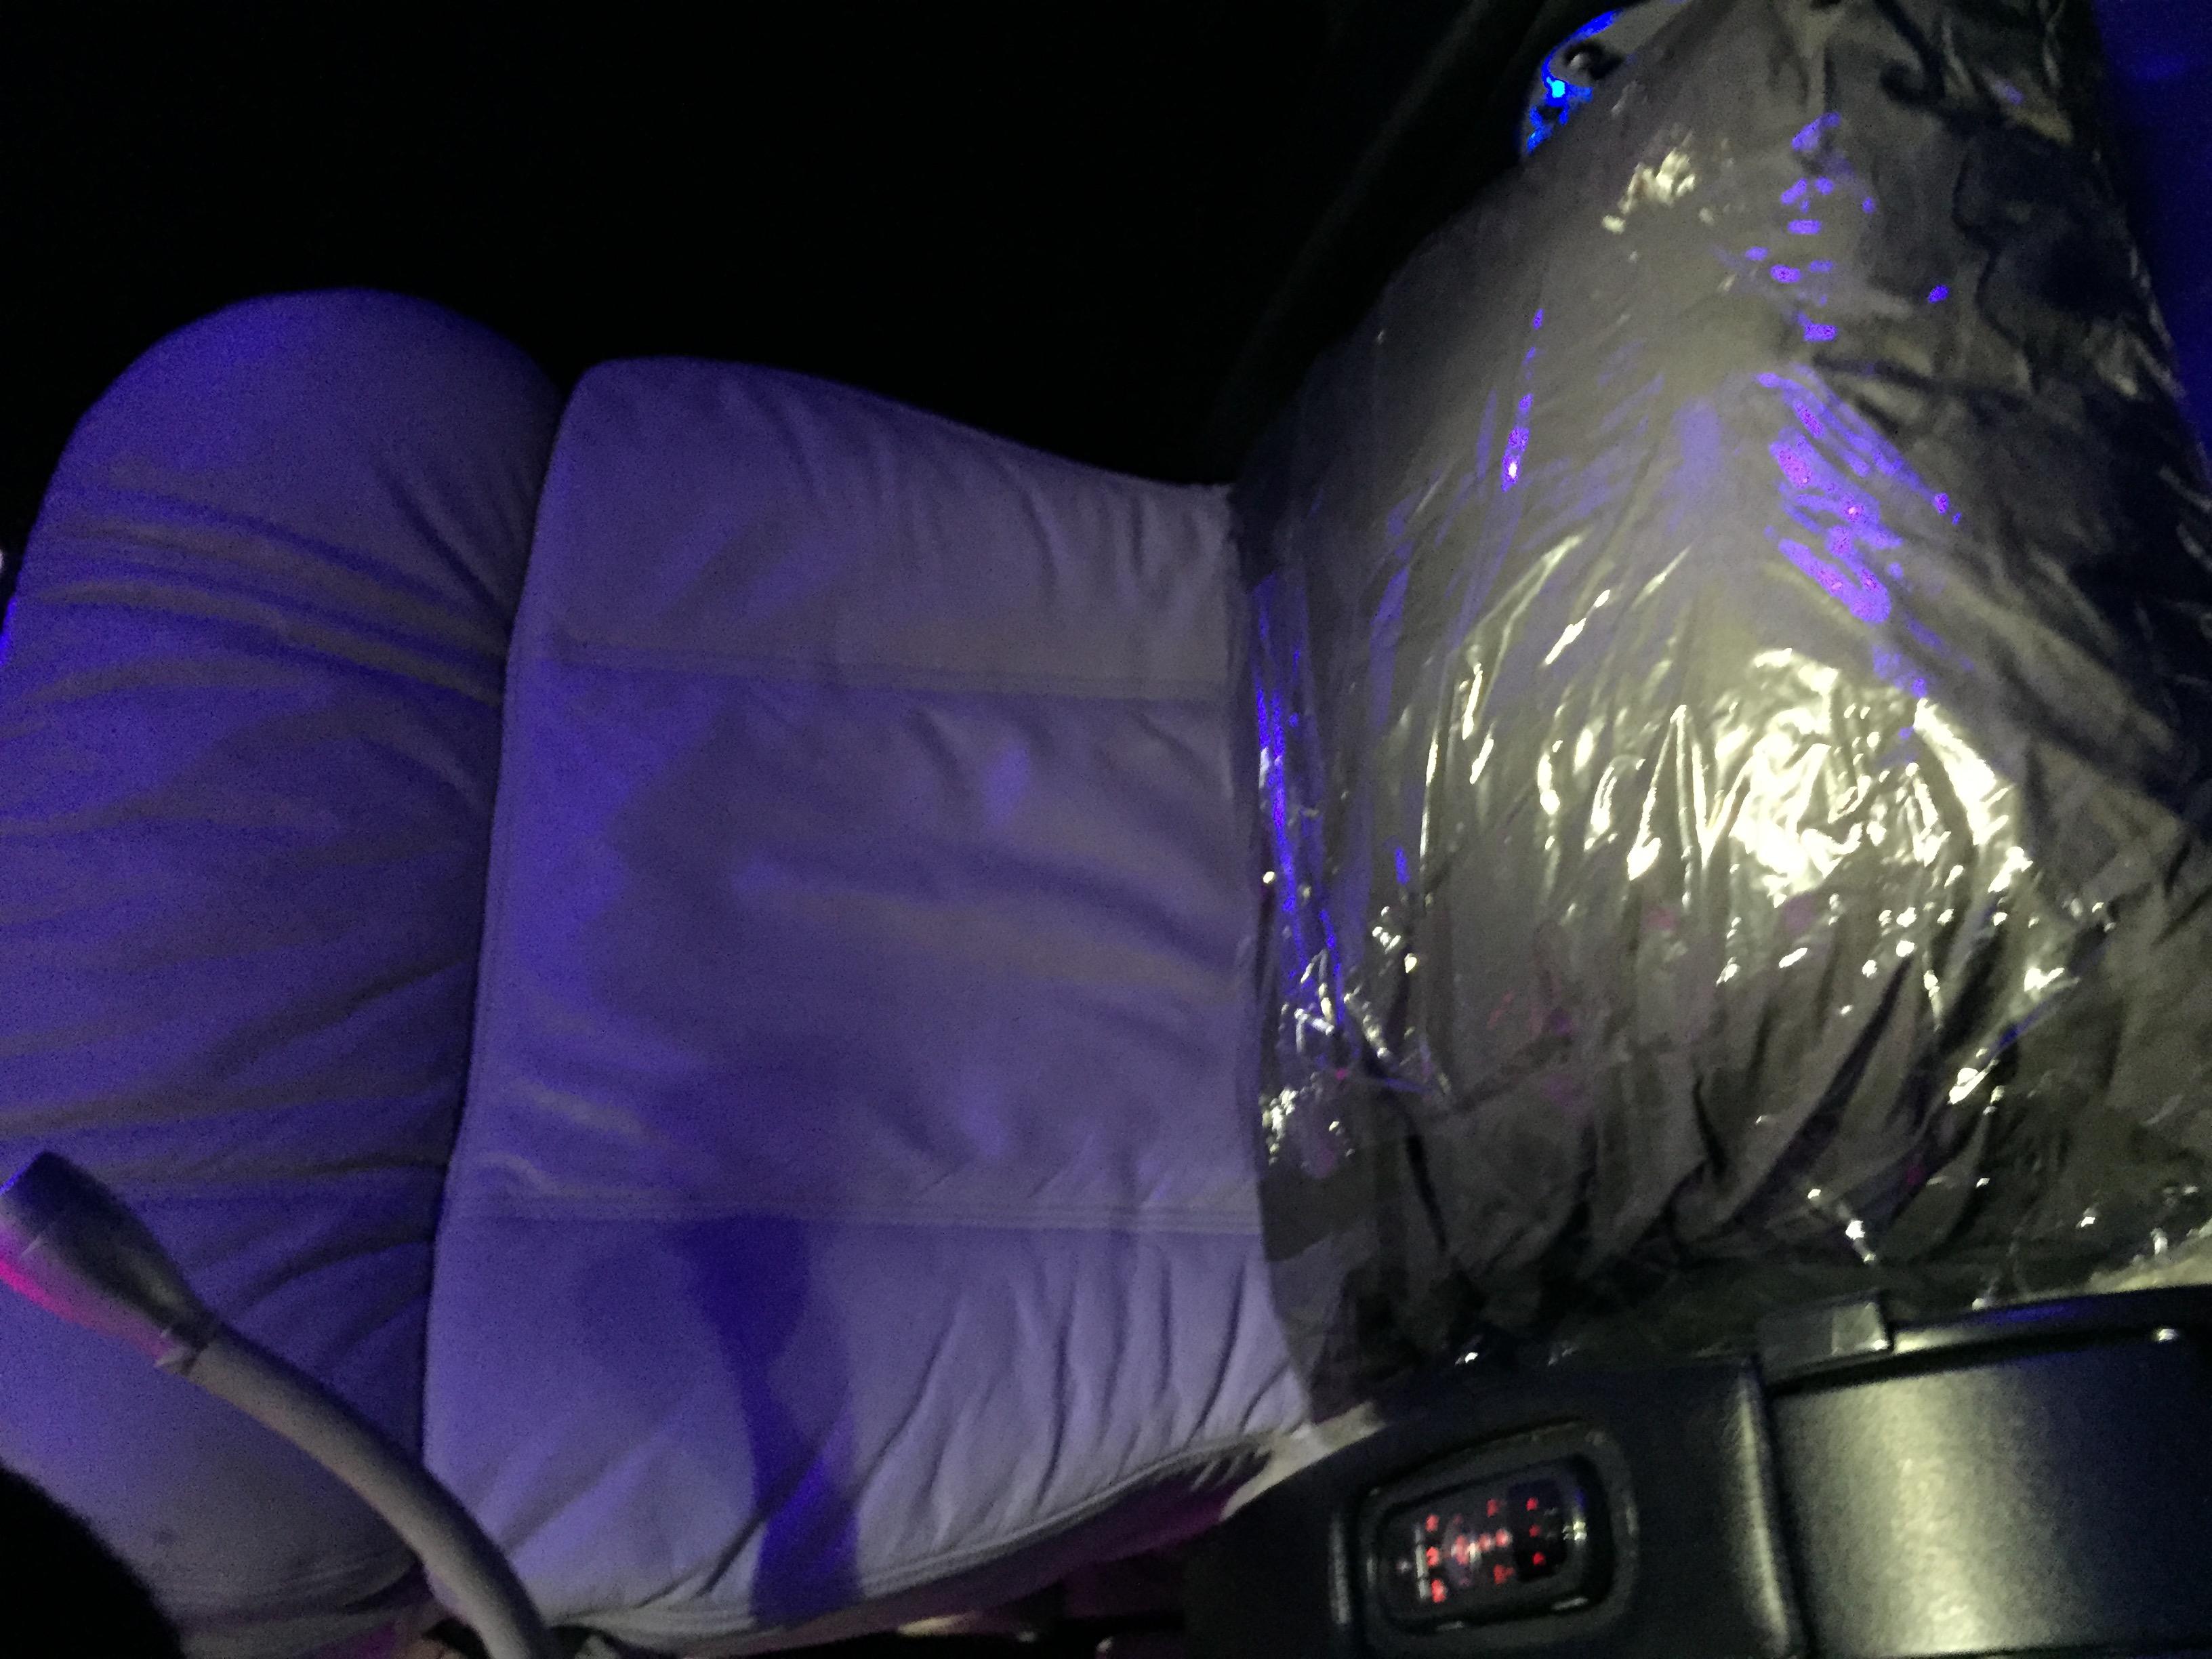 Virgin America First Class Seat Review